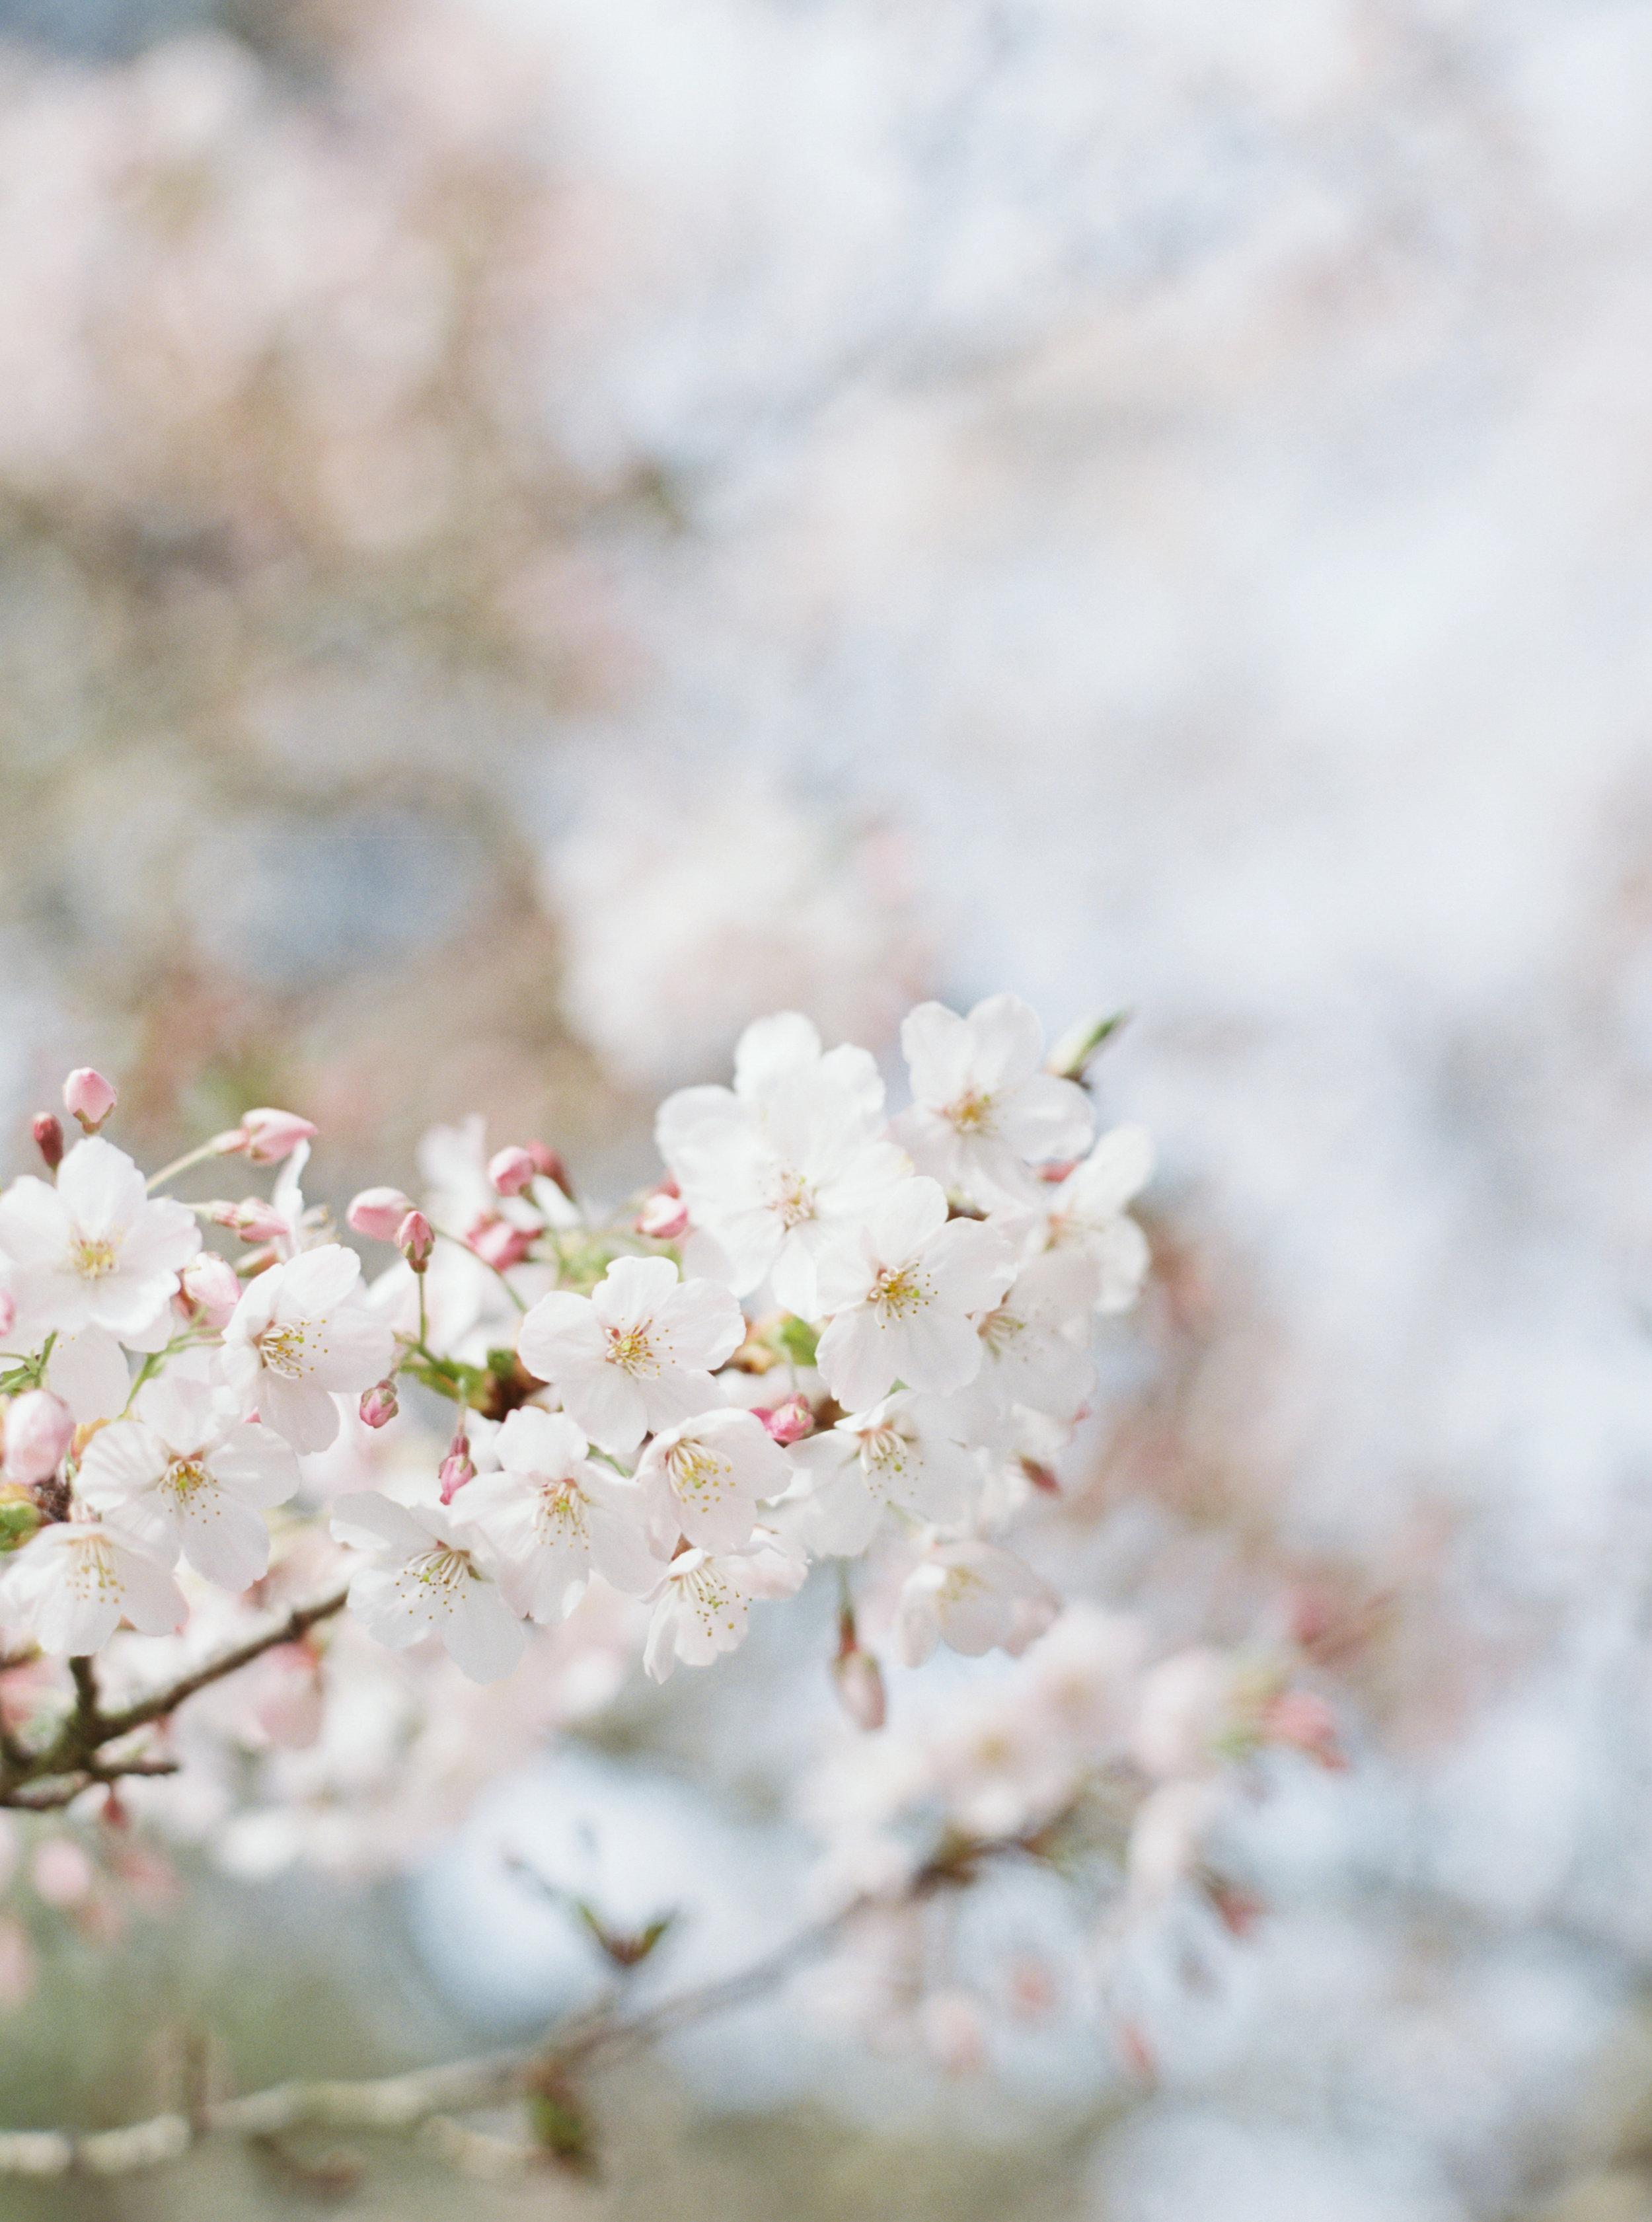 Cherry Blossoms shot on film - www.robbiegene.com - Robbie Gene Photography - San Francisco Photographer - San Francisco - Bay Area - California - 20193.jpg